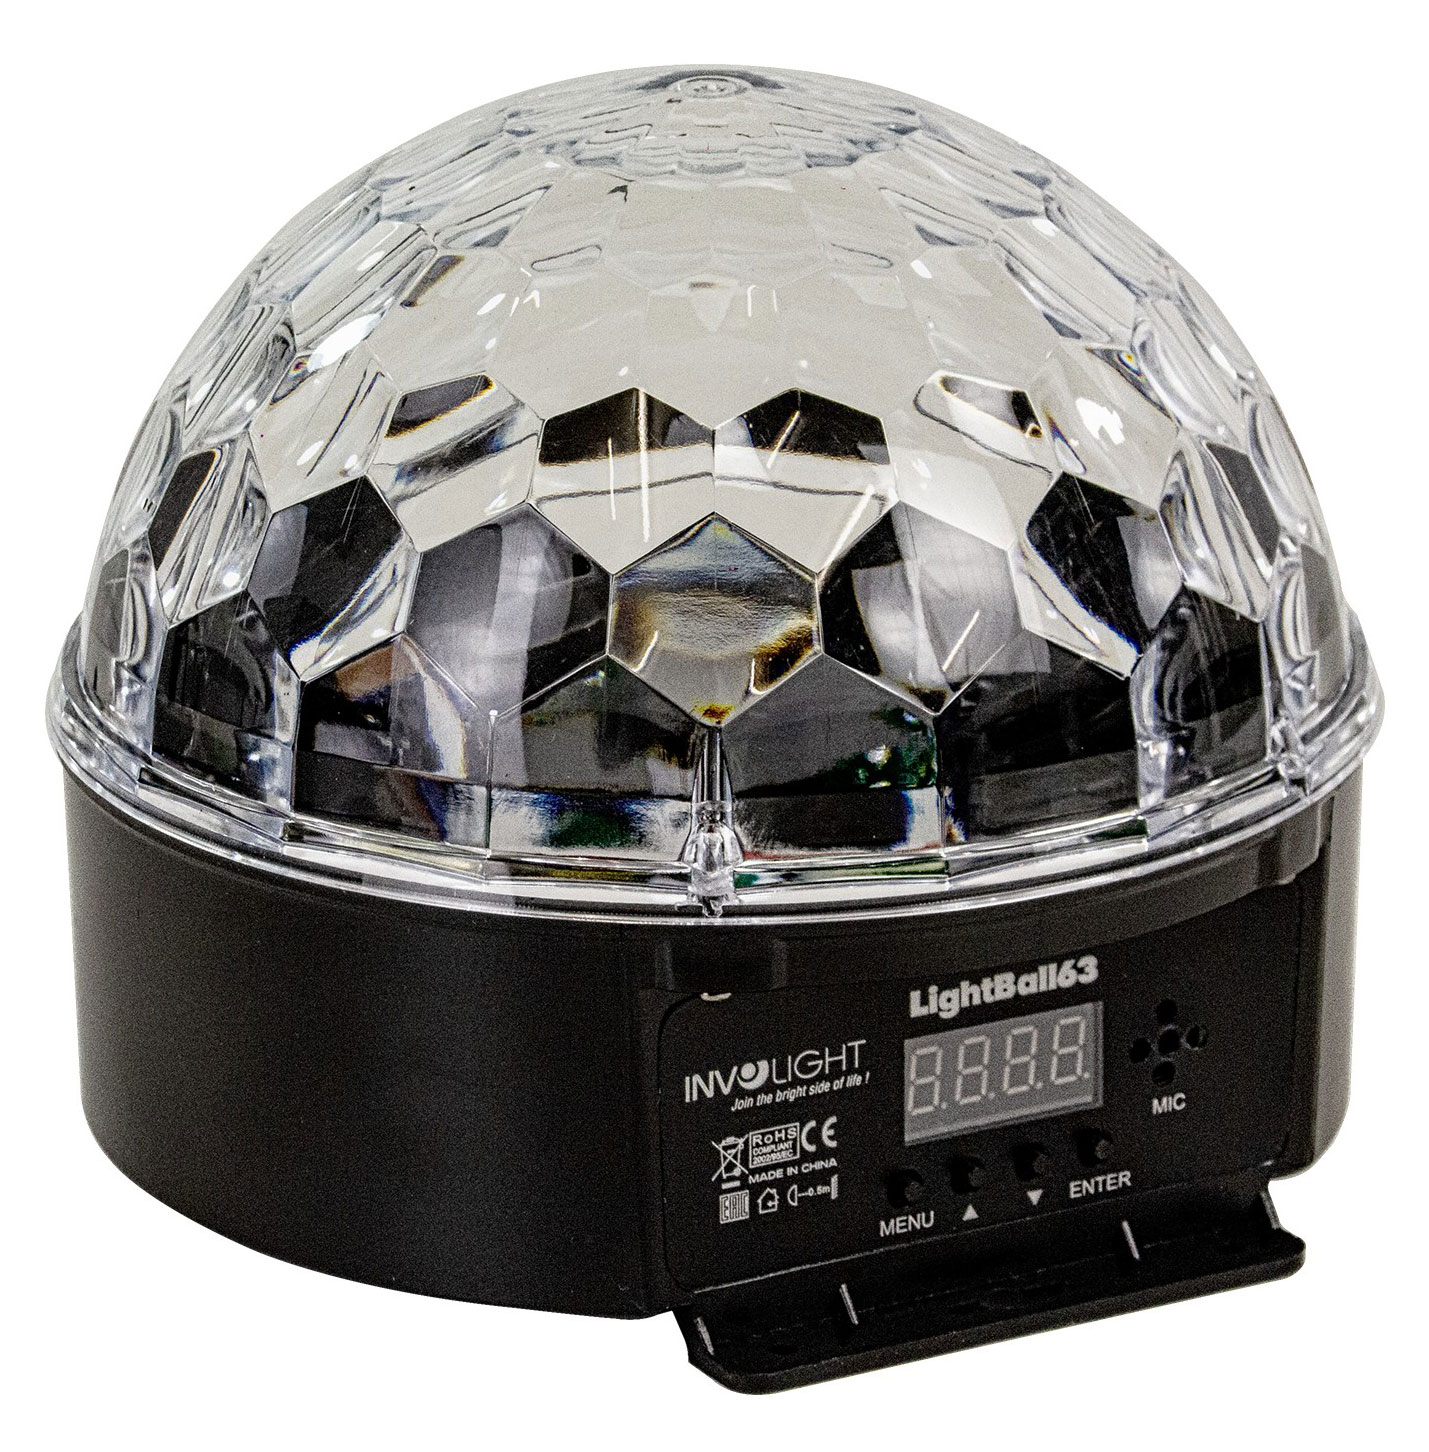 Lichteffekte - Involight LightBall63 - Onlineshop Musikhaus Kirstein